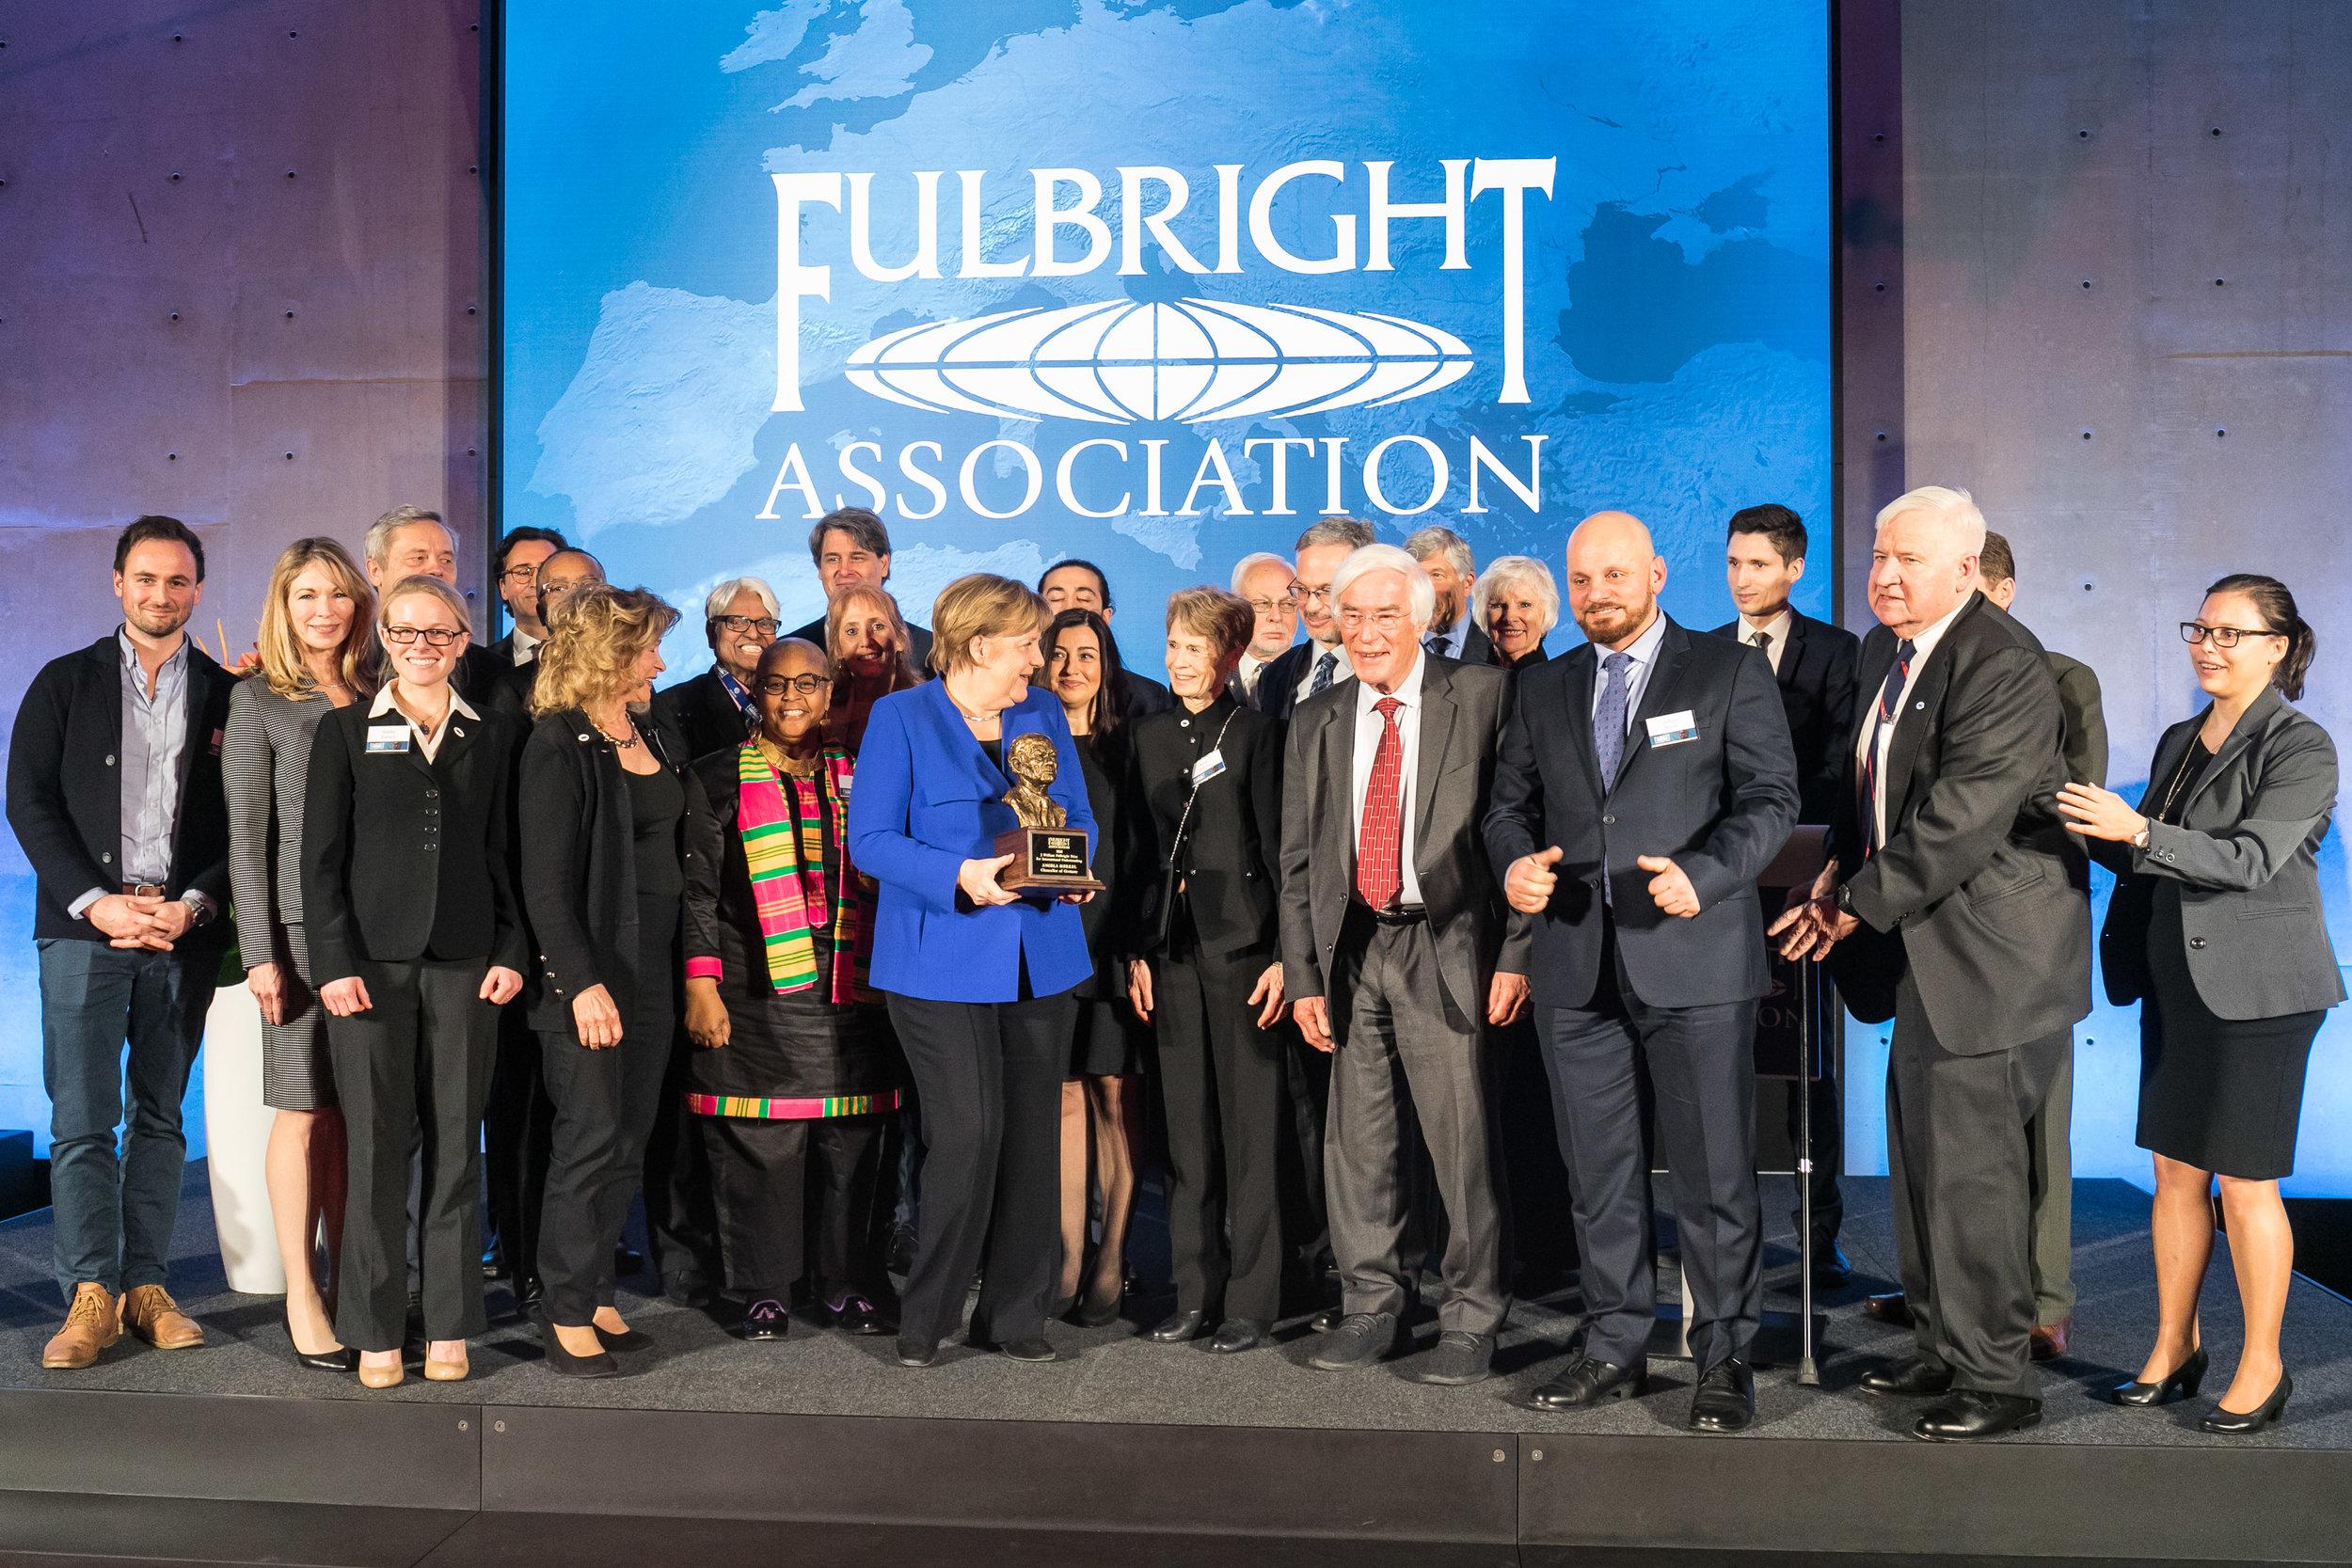 Dr. Caroline Levander, Fulbright Board members, and Chancellor of Germany, Angela Merkel.